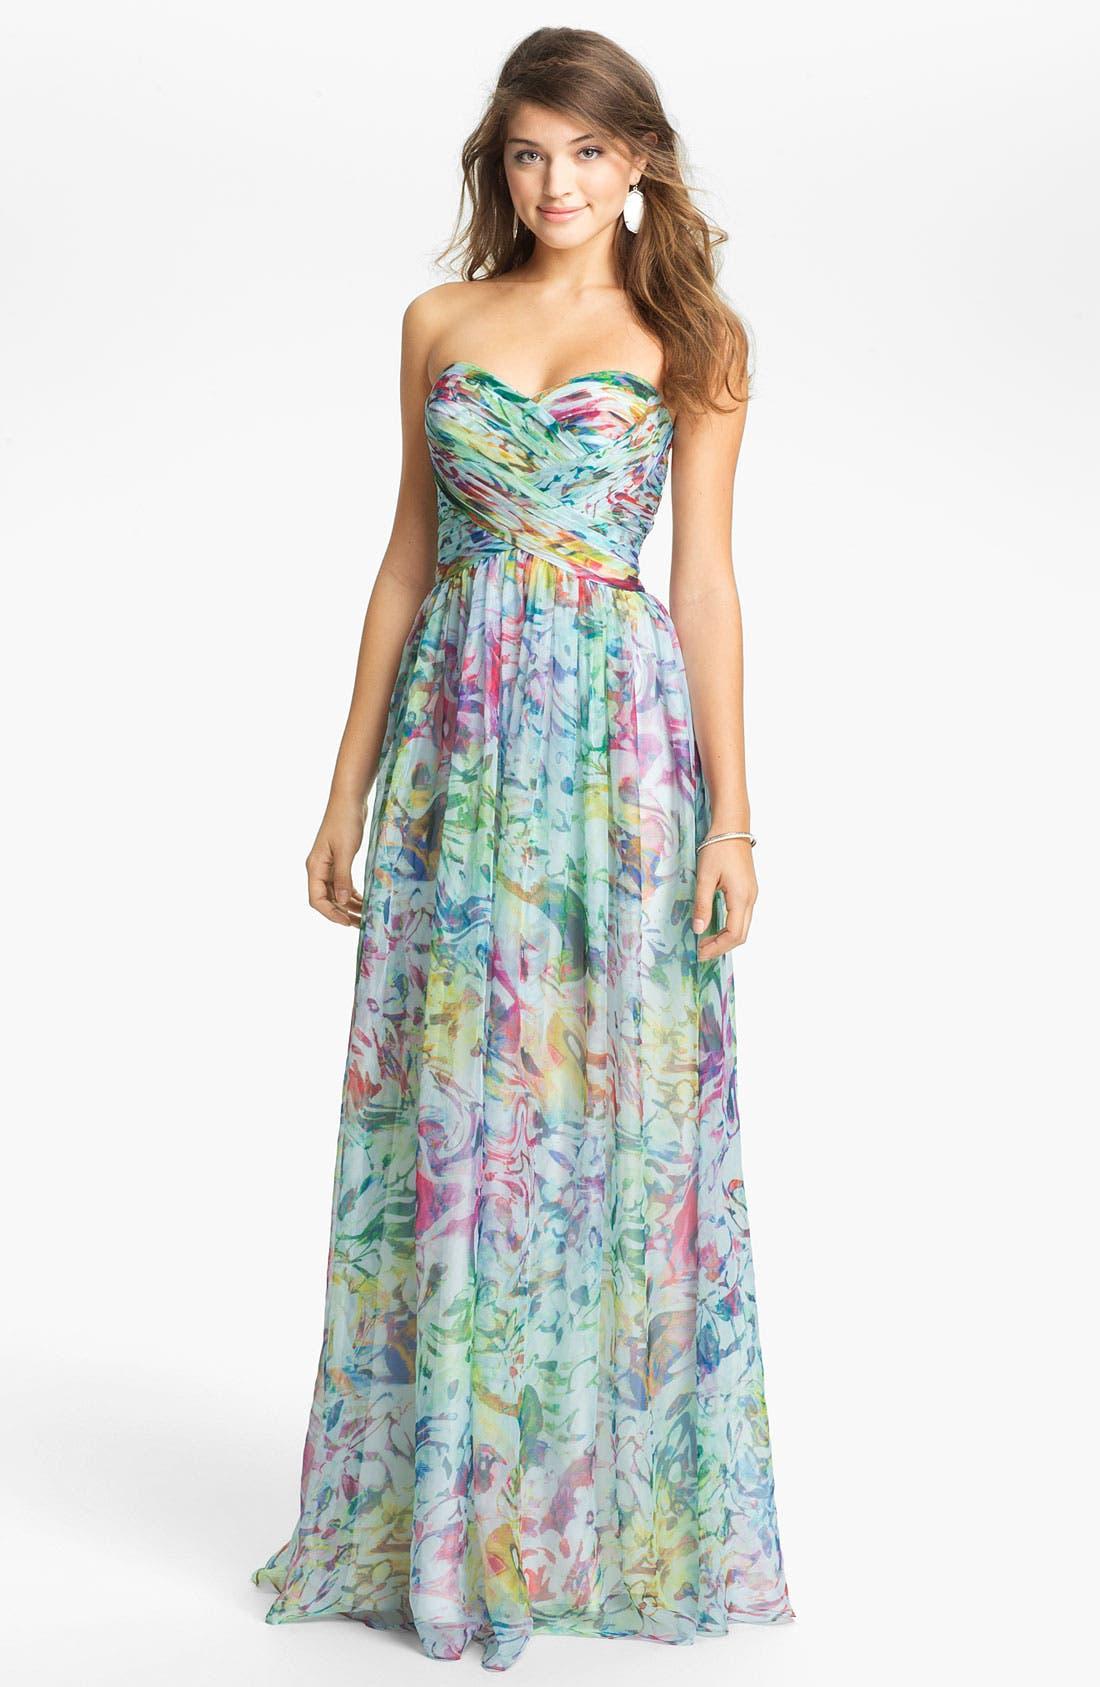 Main Image - La Femme Print Strapless Maxi Dress